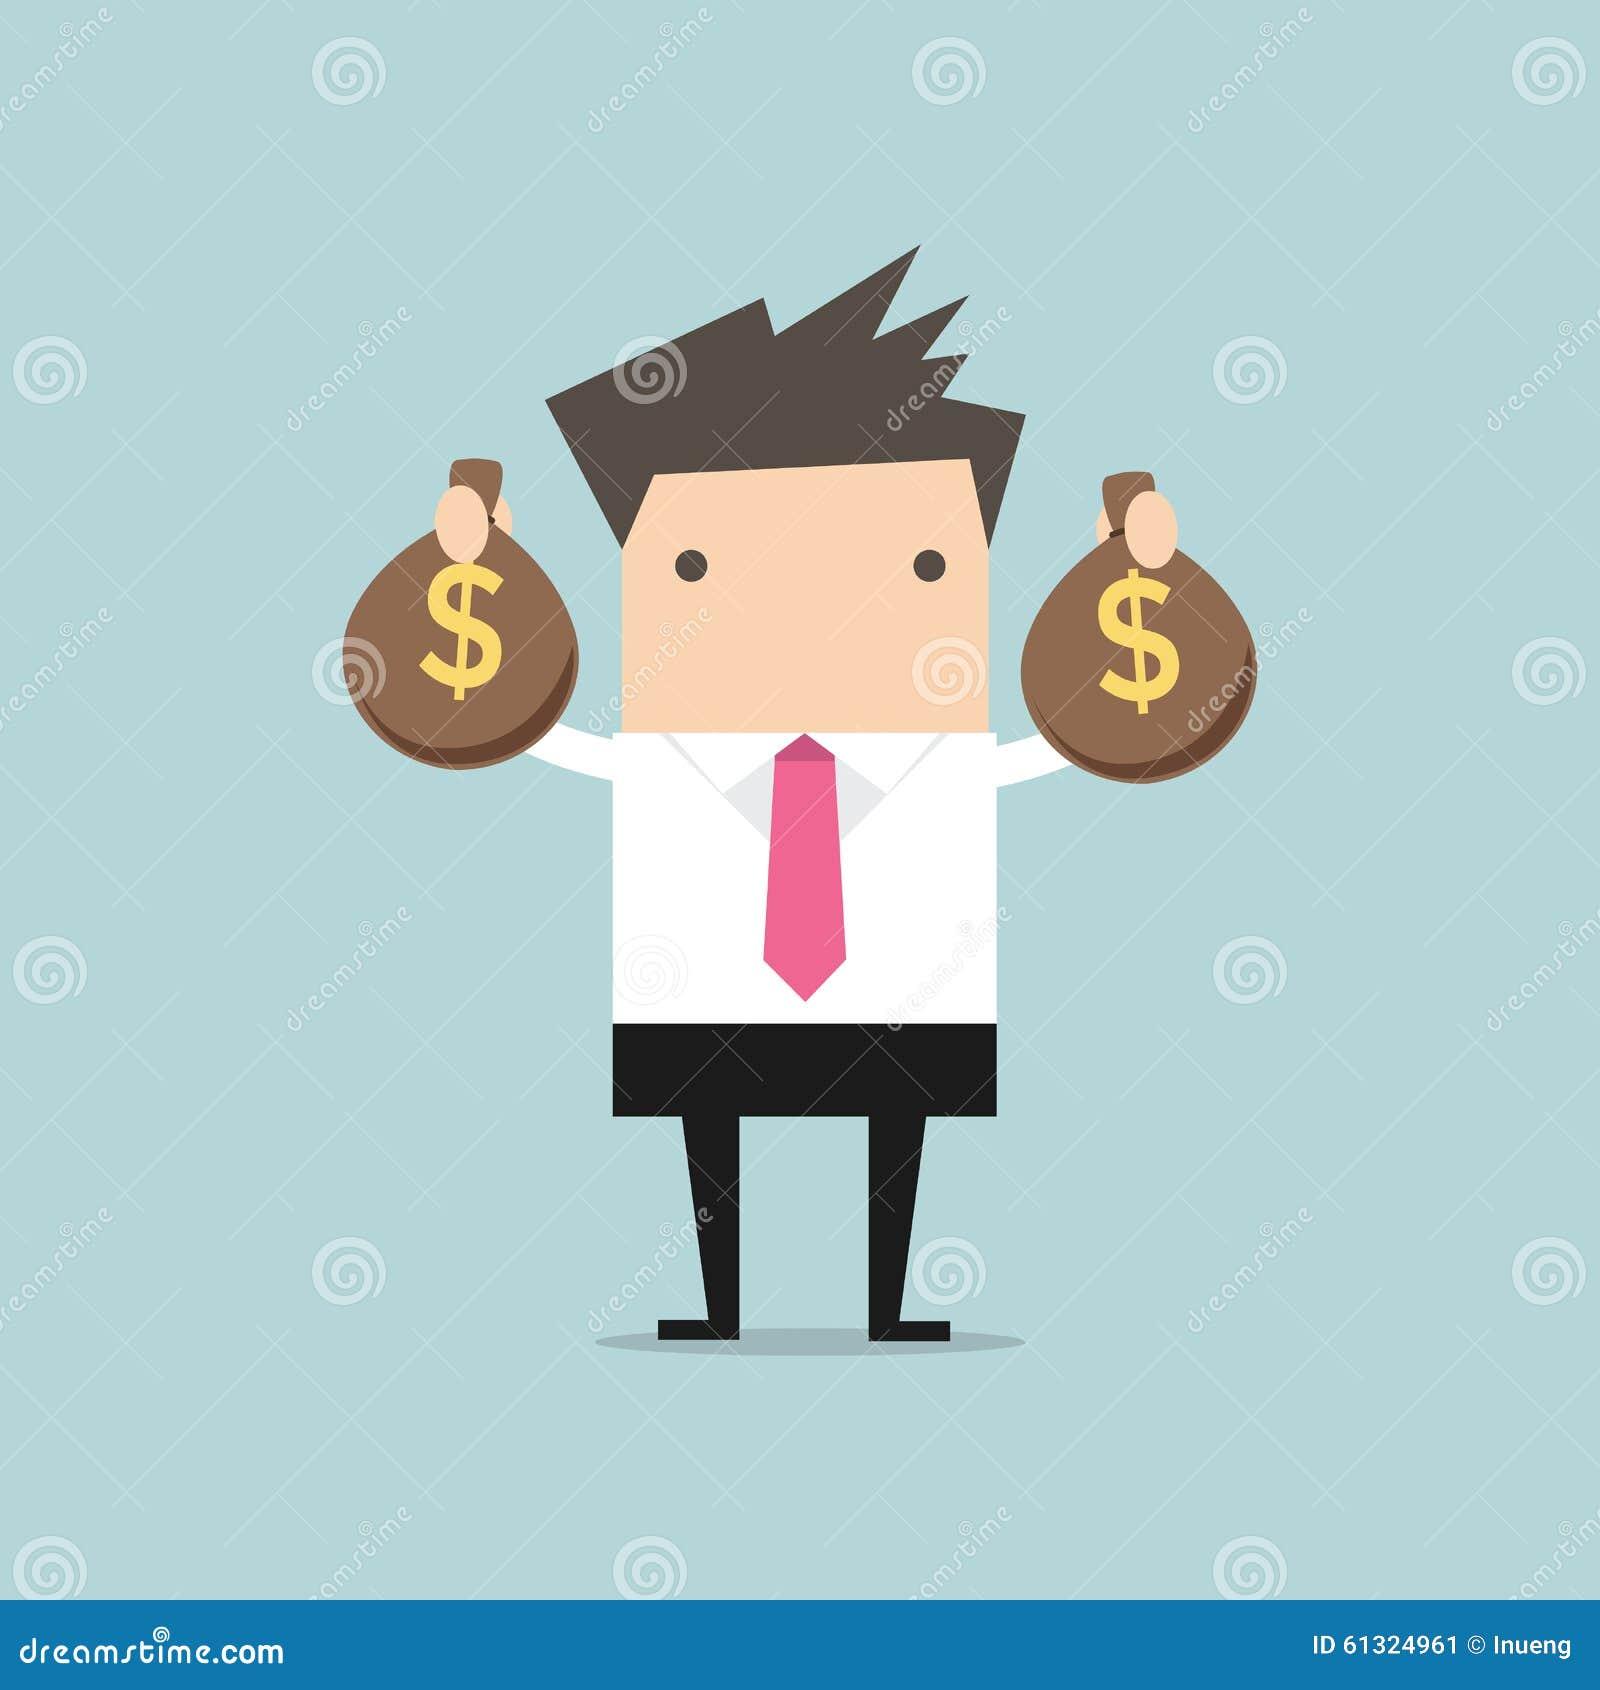 Businessman holding money bag in hands